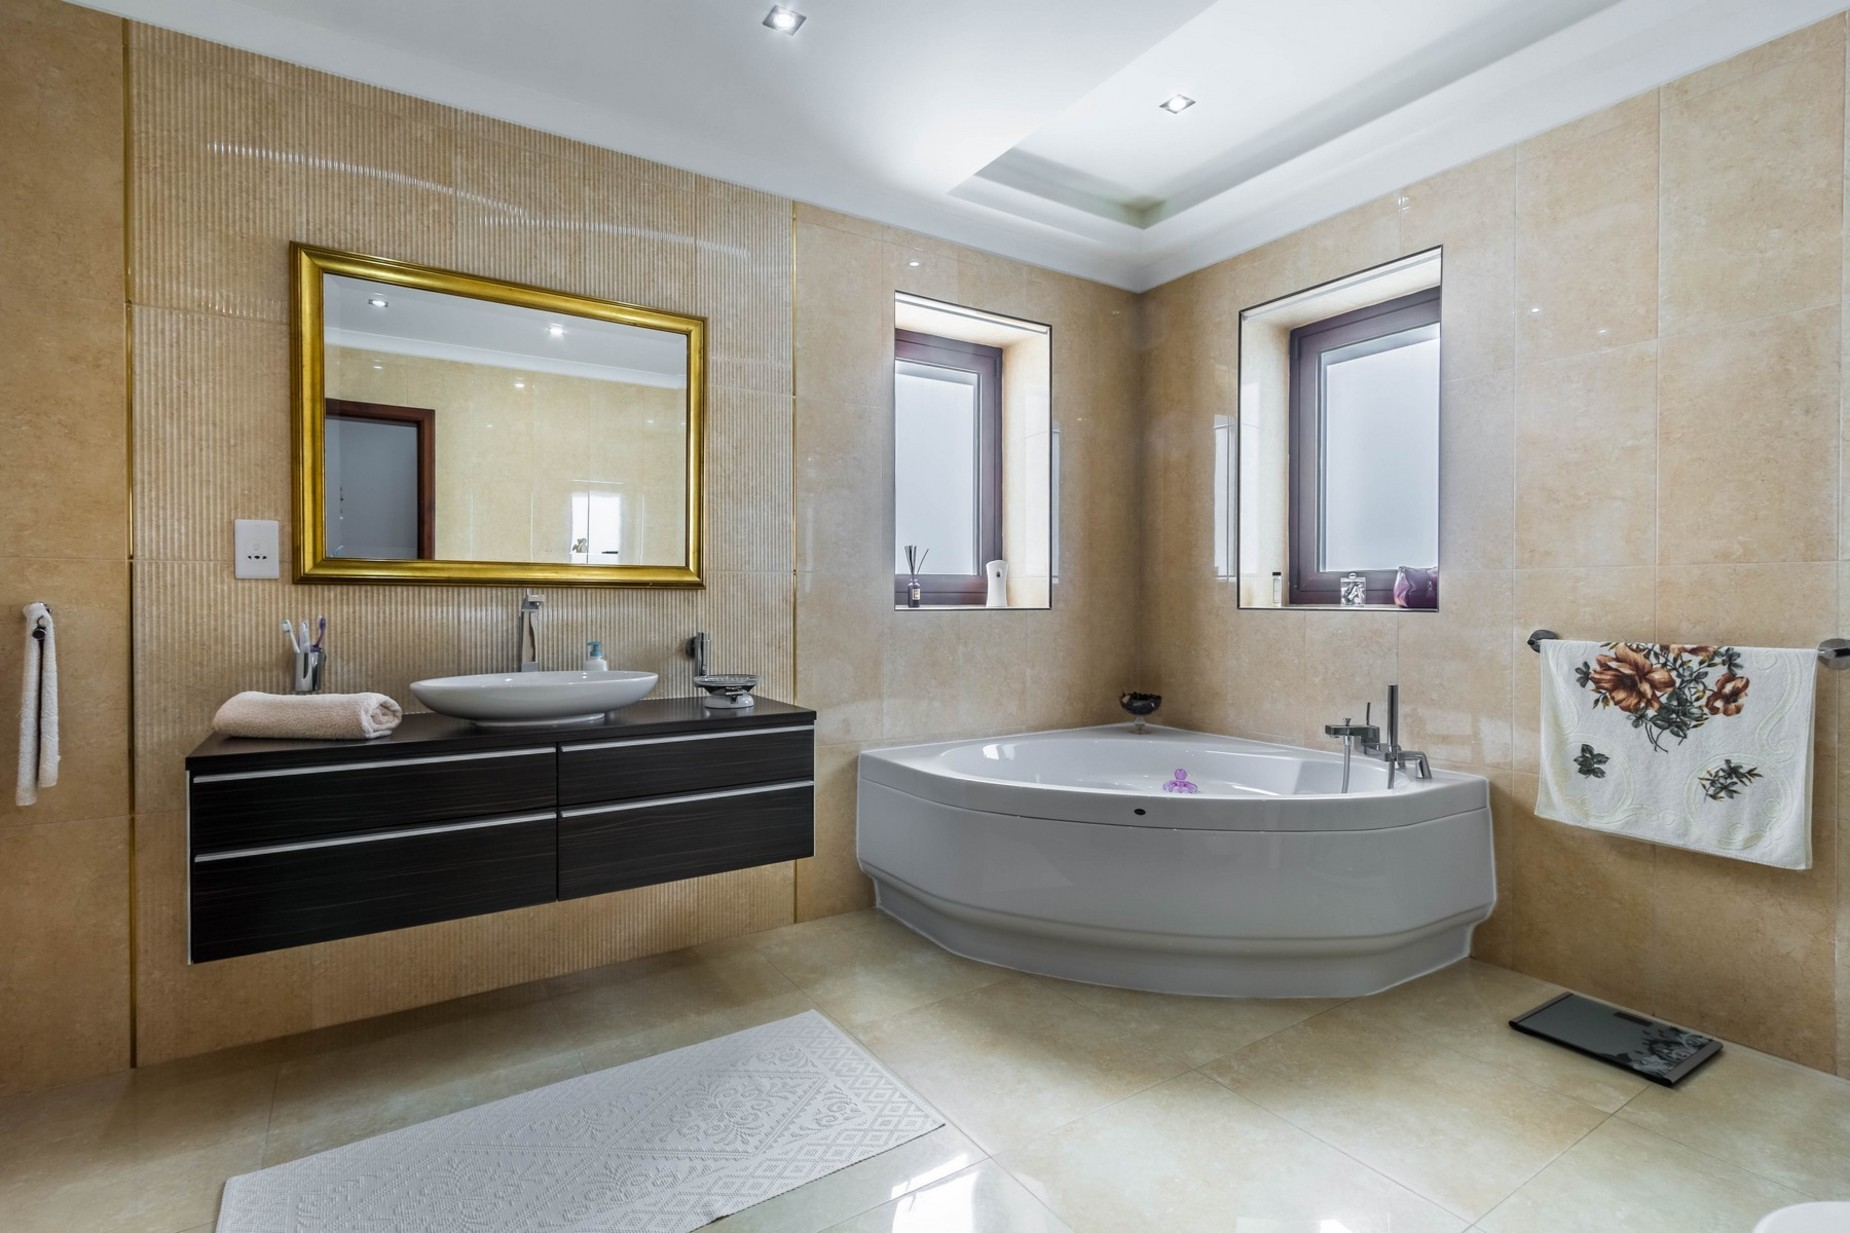 4 bed Villa For Sale in Naxxar, Naxxar - thumb 9